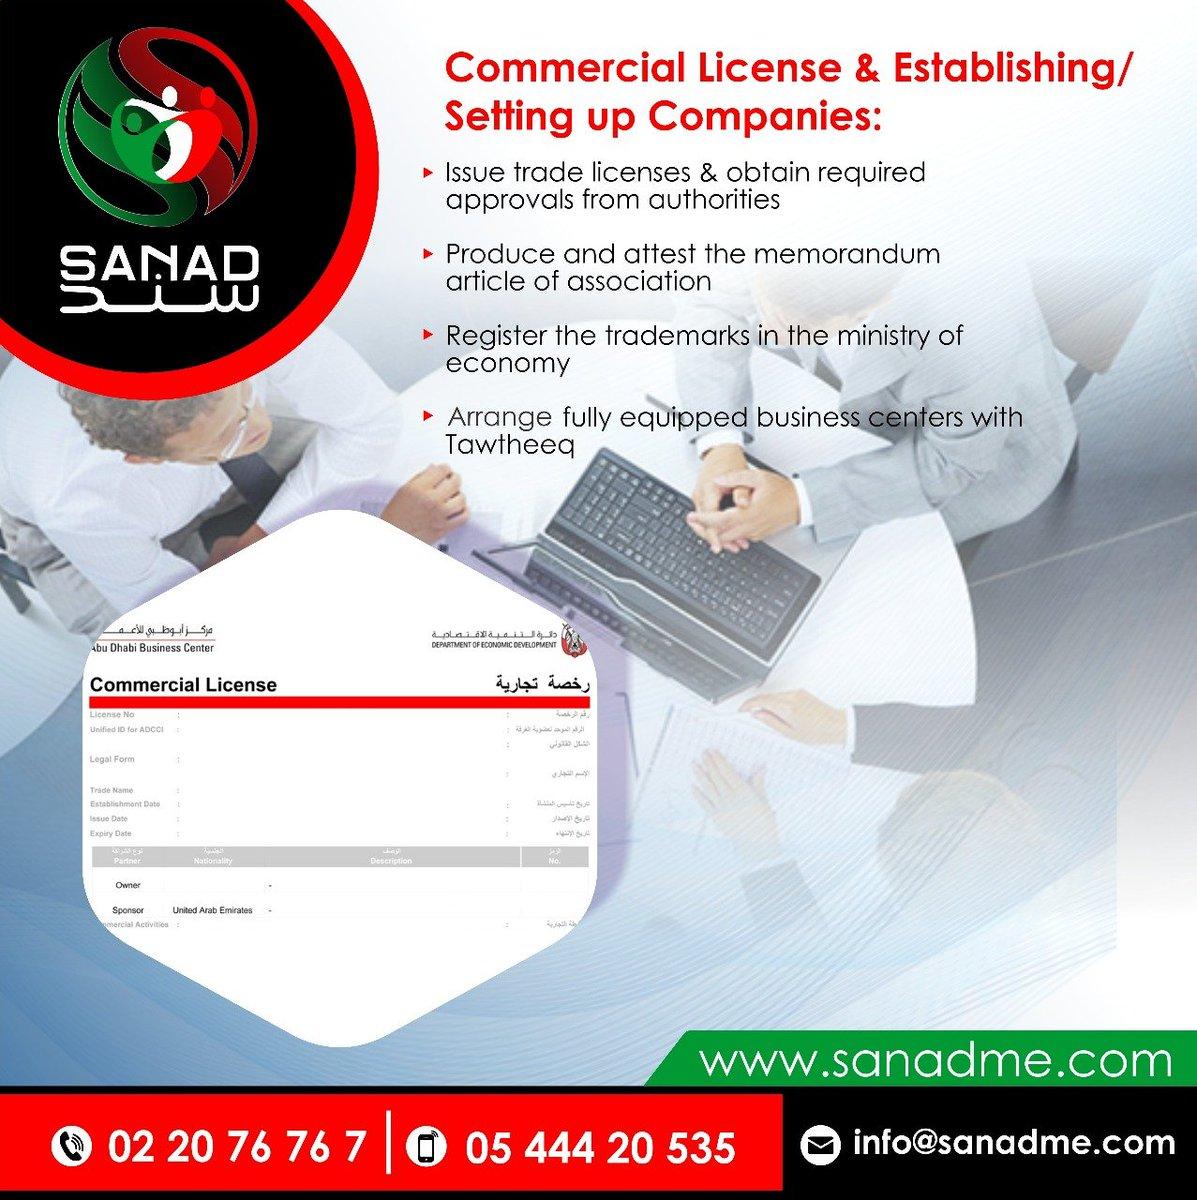 Sanad Services - سند للخدمات on Twitter: